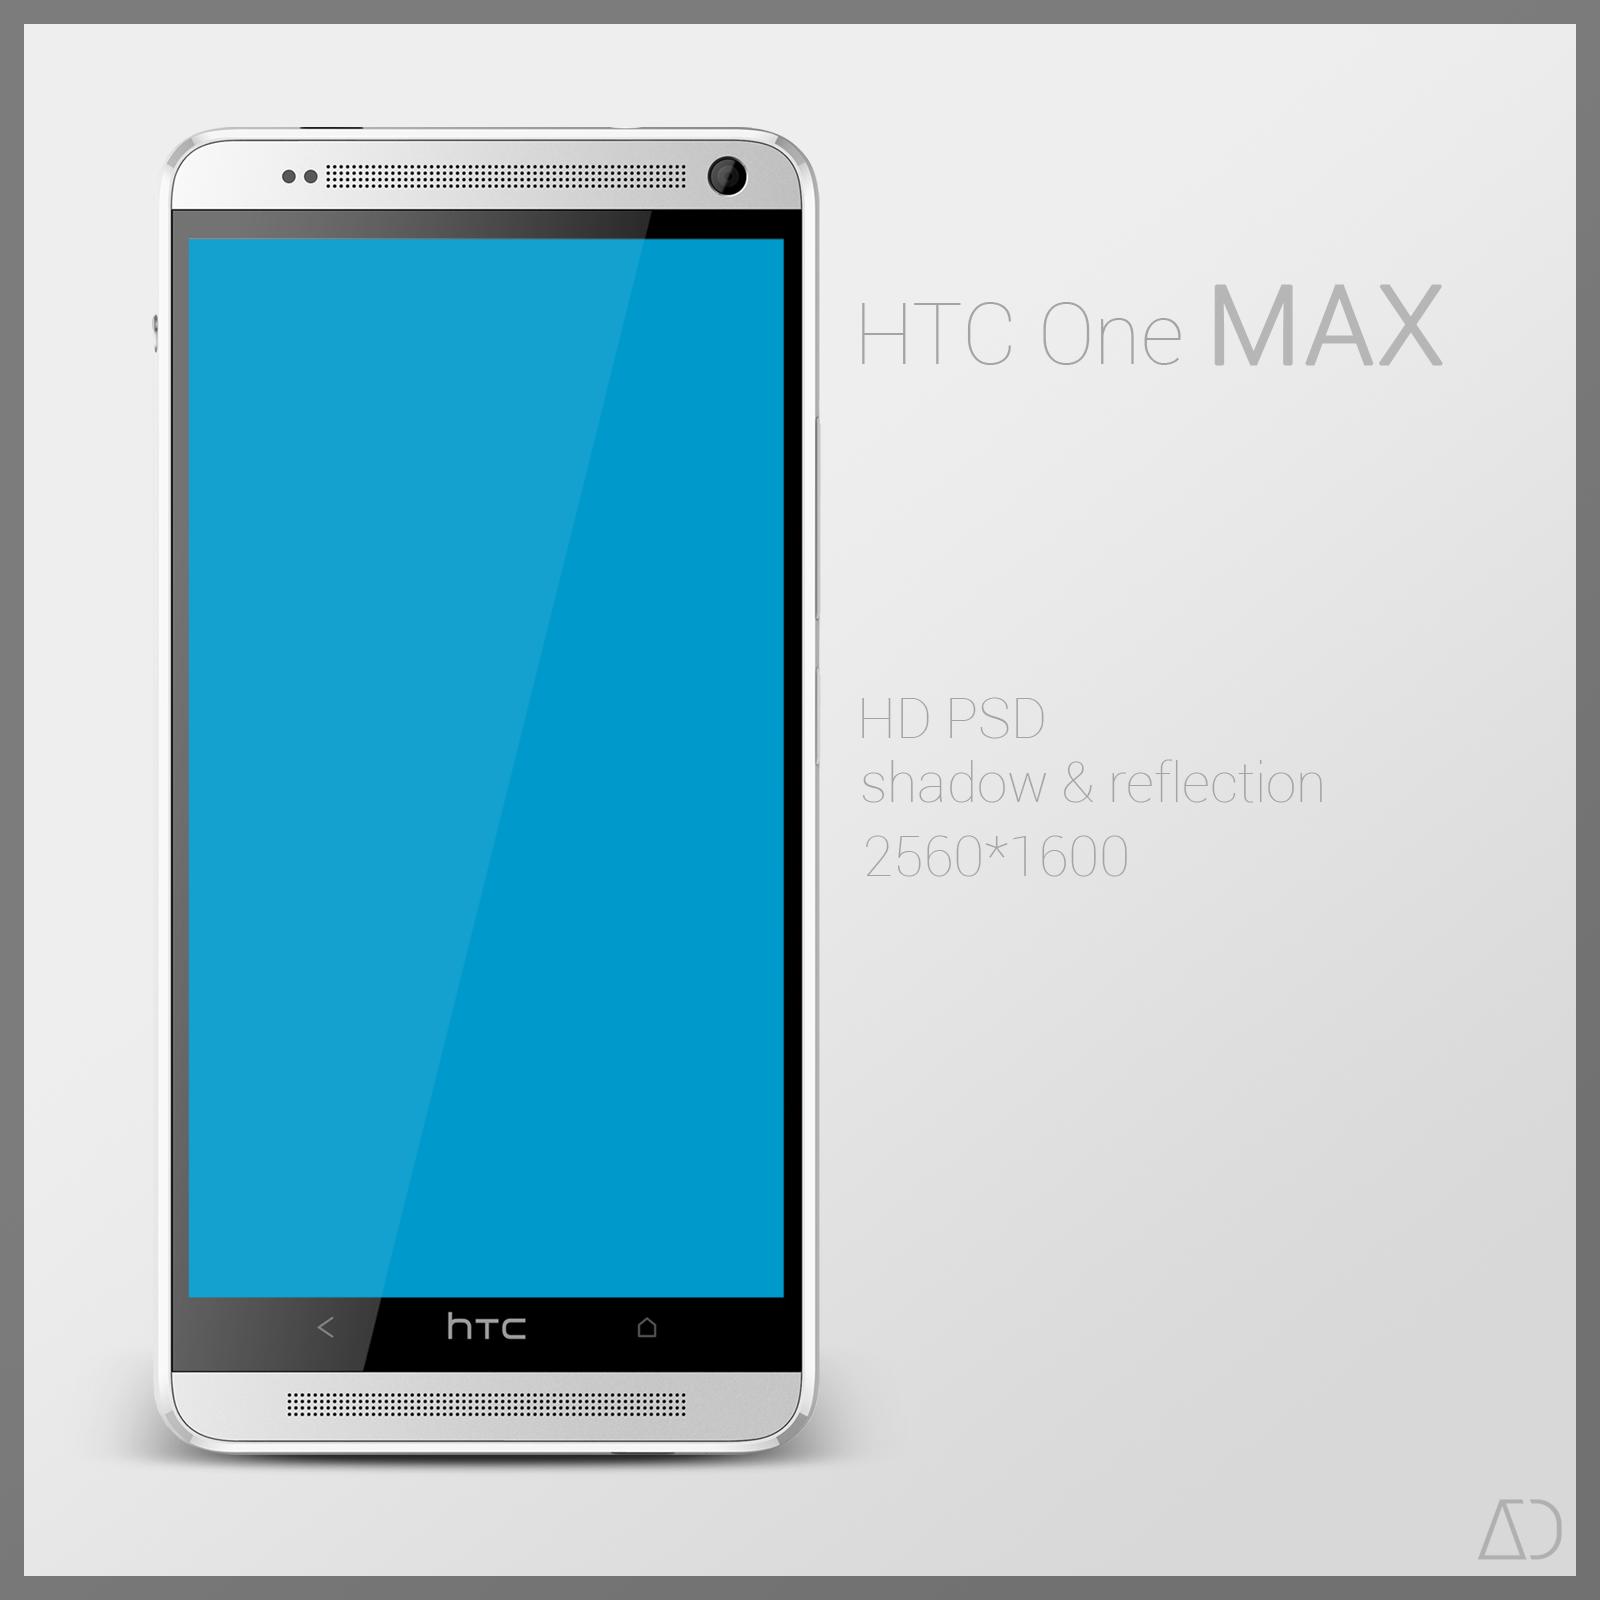 HTC One MAX : PSD by danishprakash